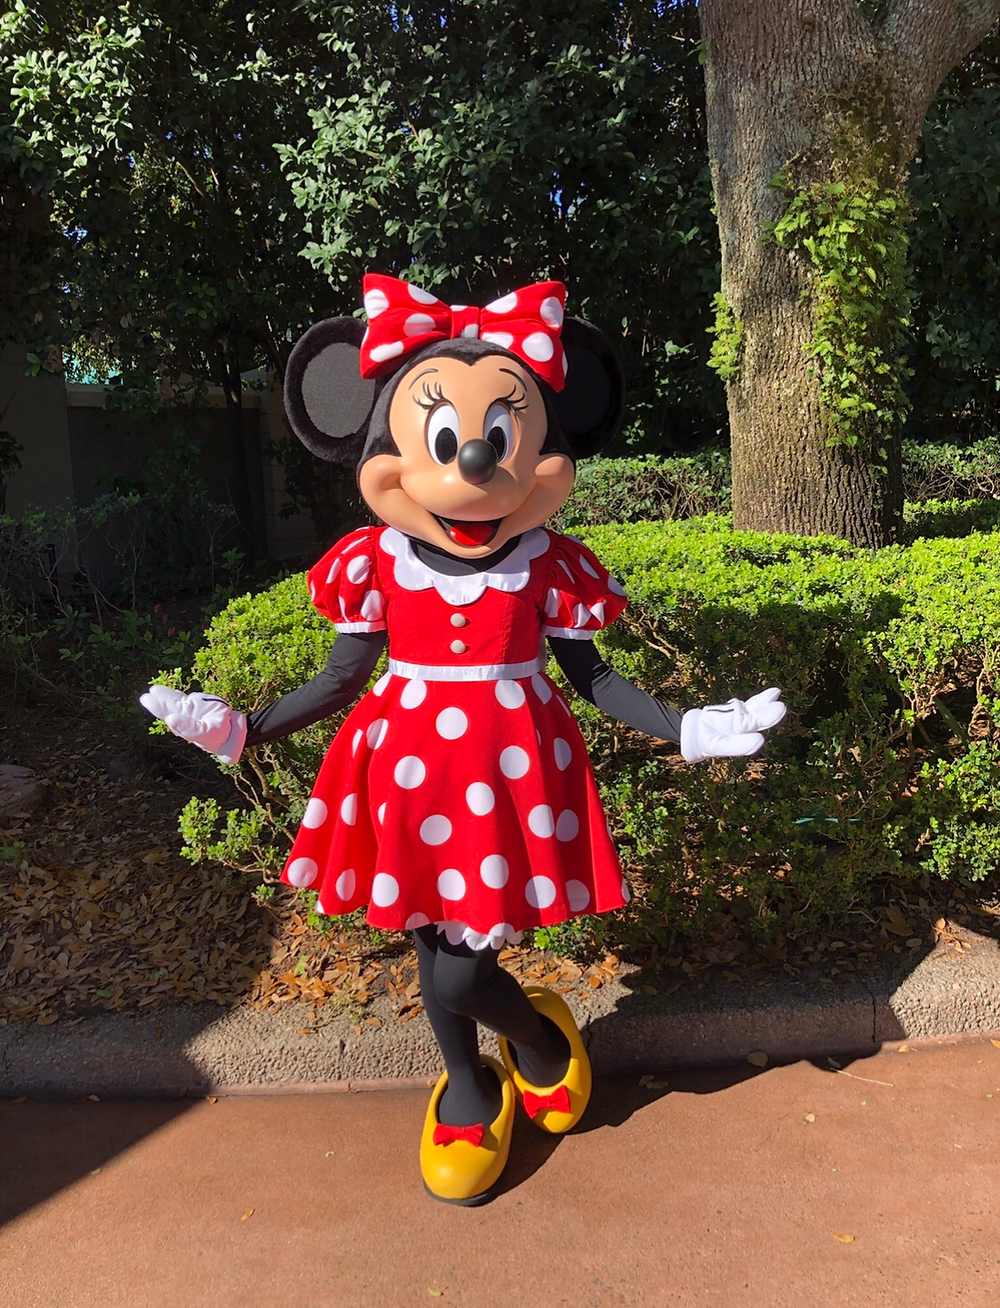 Reabertura dos parques Disney